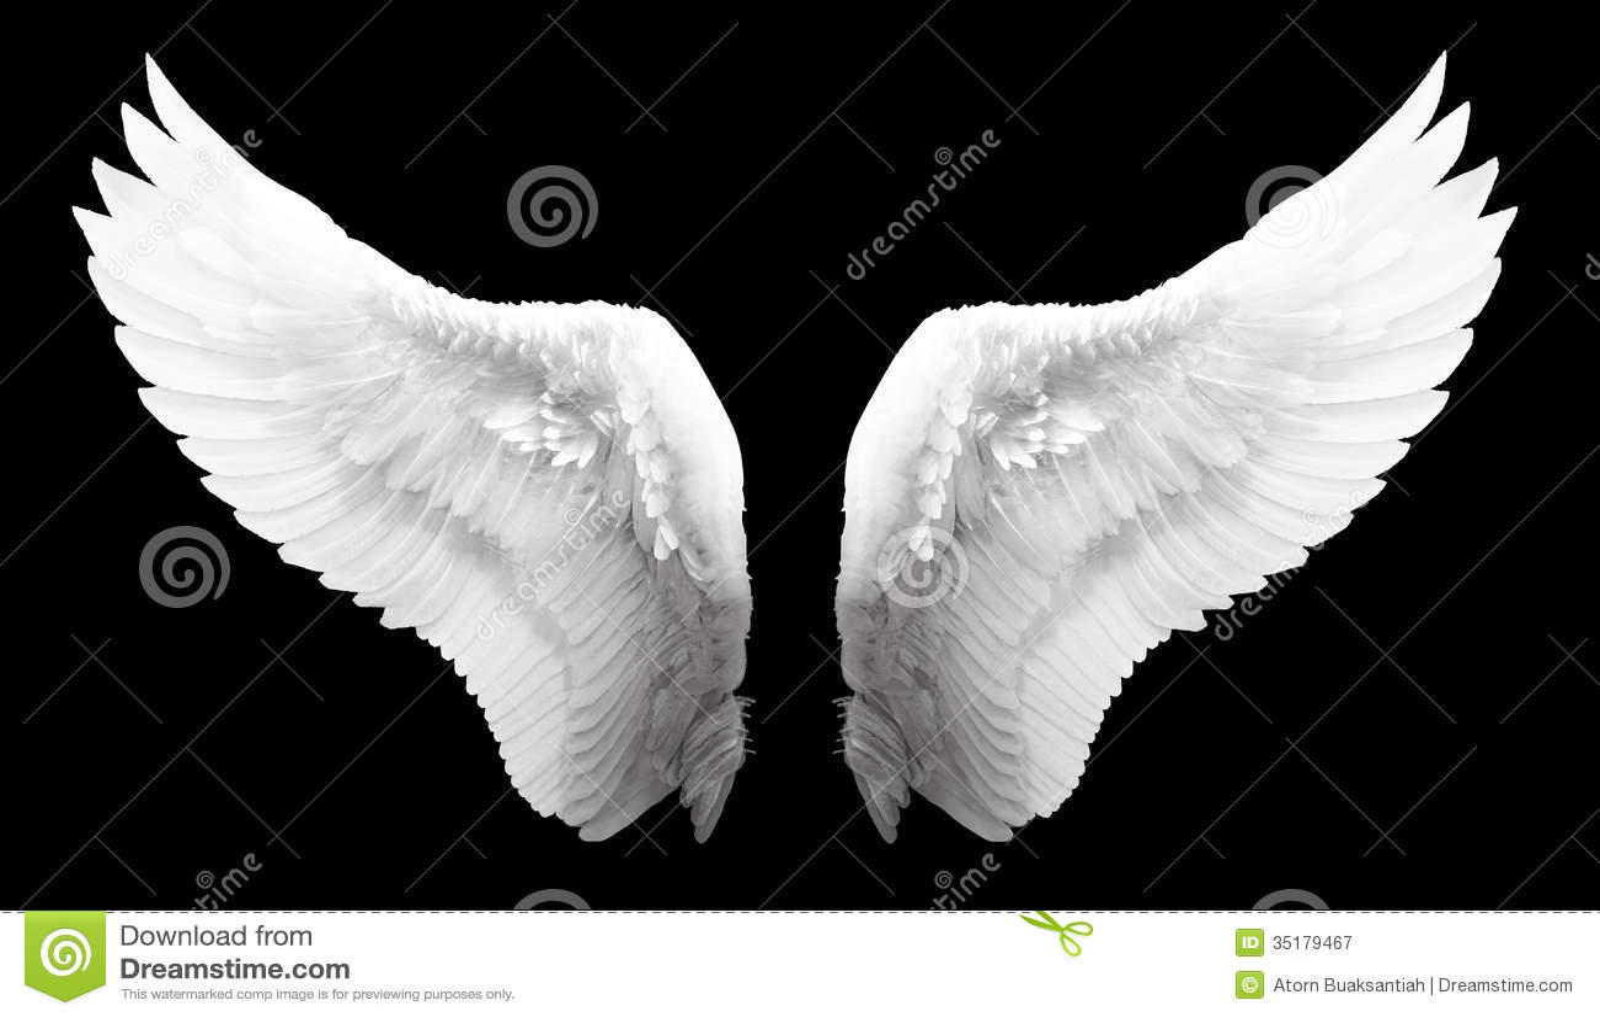 white angel wing isolated stock image image of background 35179467